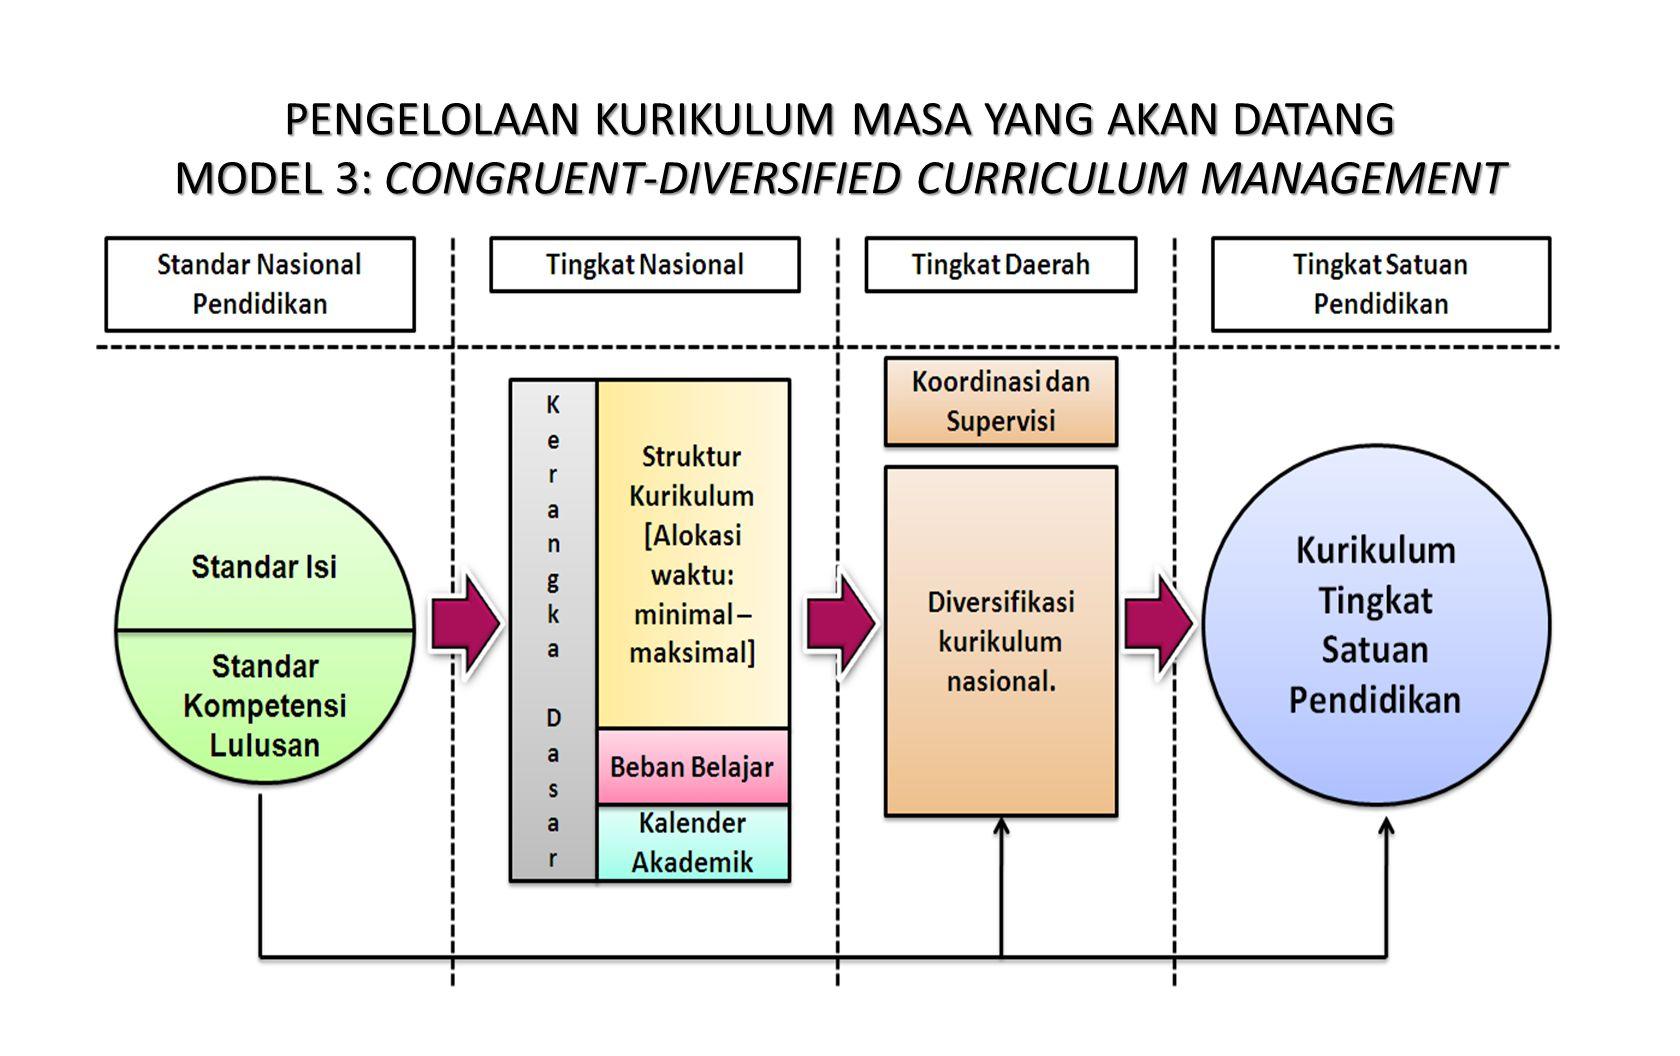 PENGELOLAAN KURIKULUM MASA YANG AKAN DATANG MODEL 3: CONGRUENT-DIVERSIFIED CURRICULUM MANAGEMENT